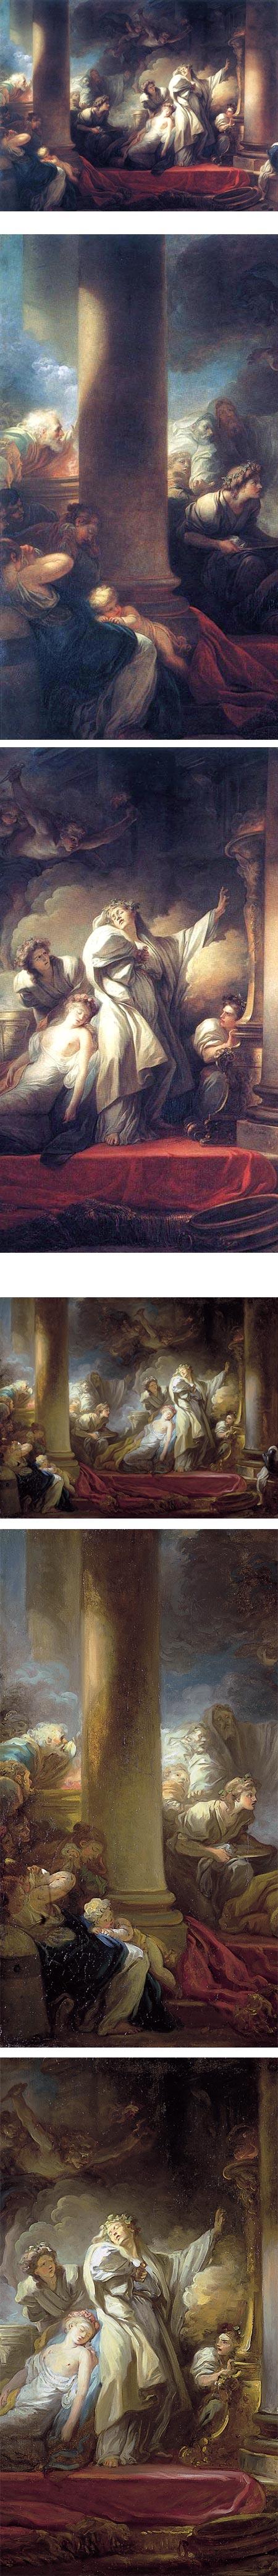 The High Priest Coresus Sacrificing Himself to Save Callirhoe, Jean-Honore Fragonard